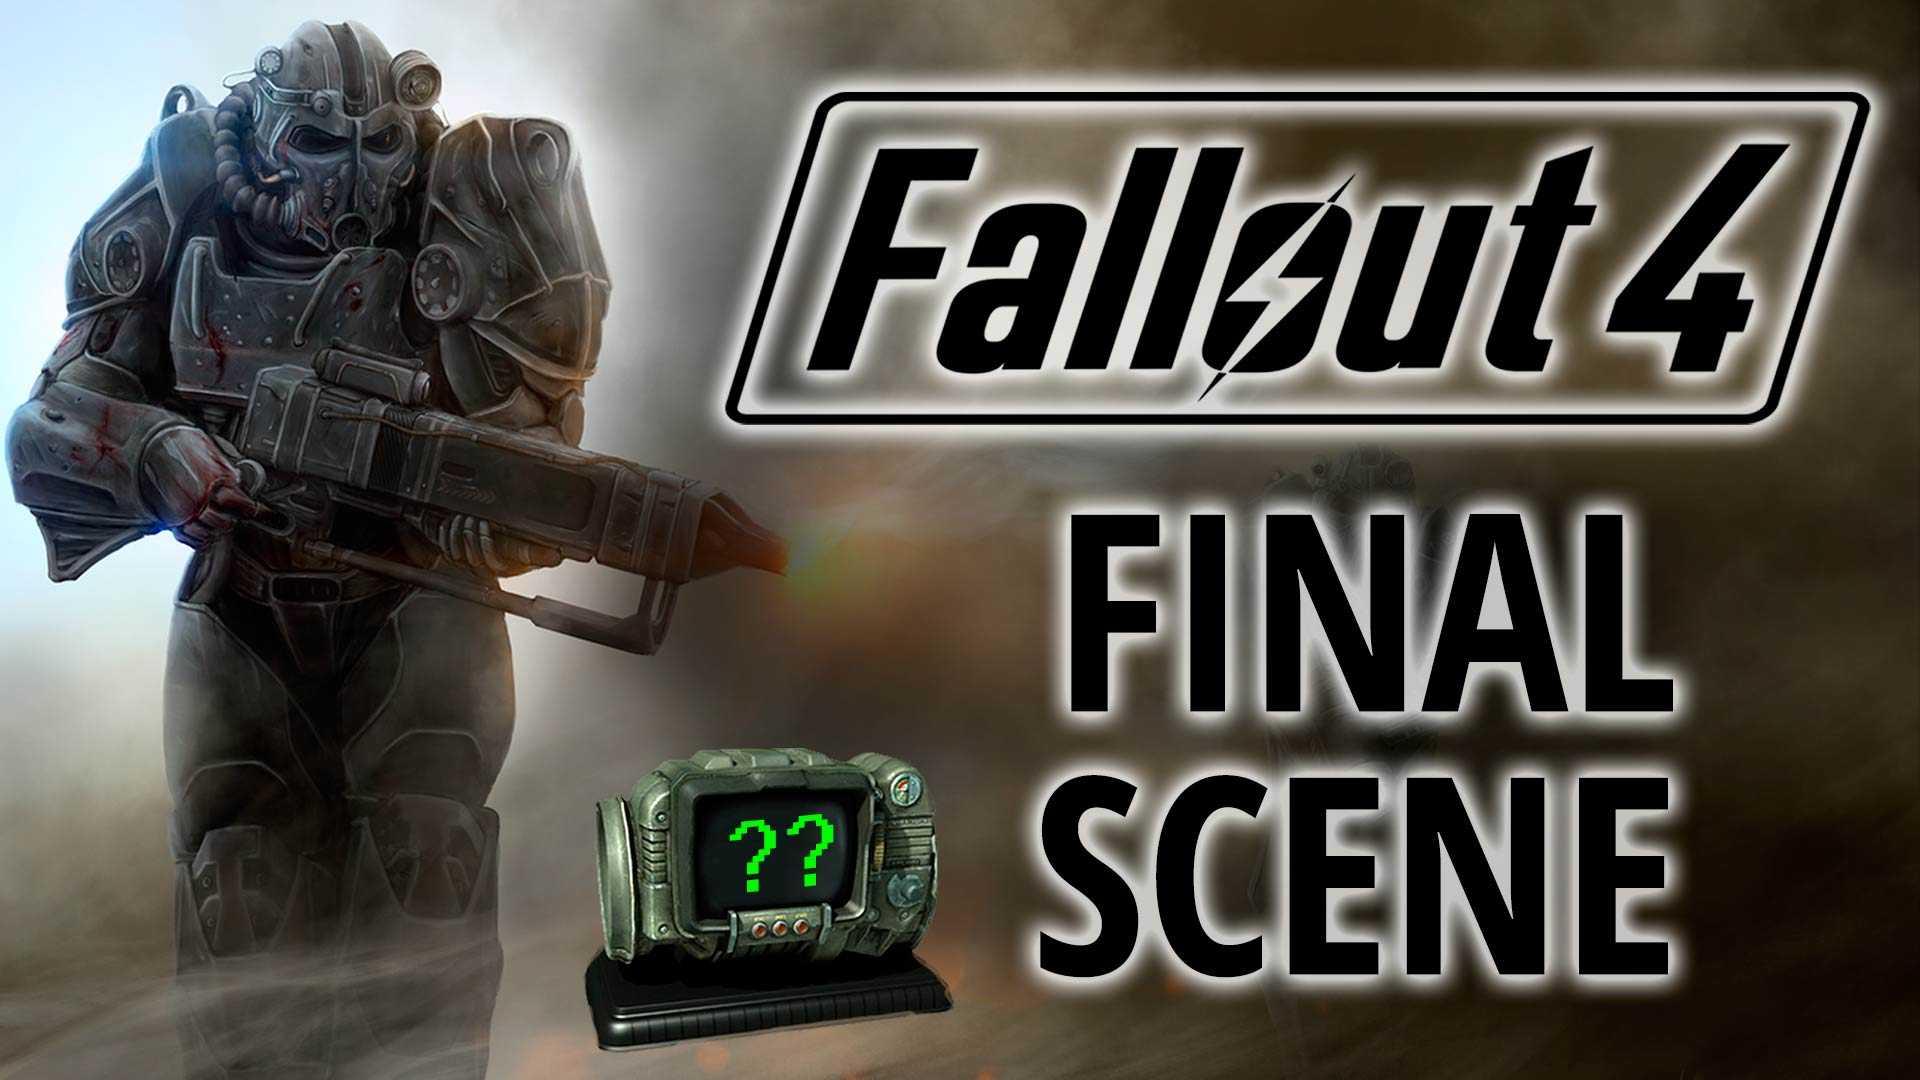 Финальная сцена из Fallout 4